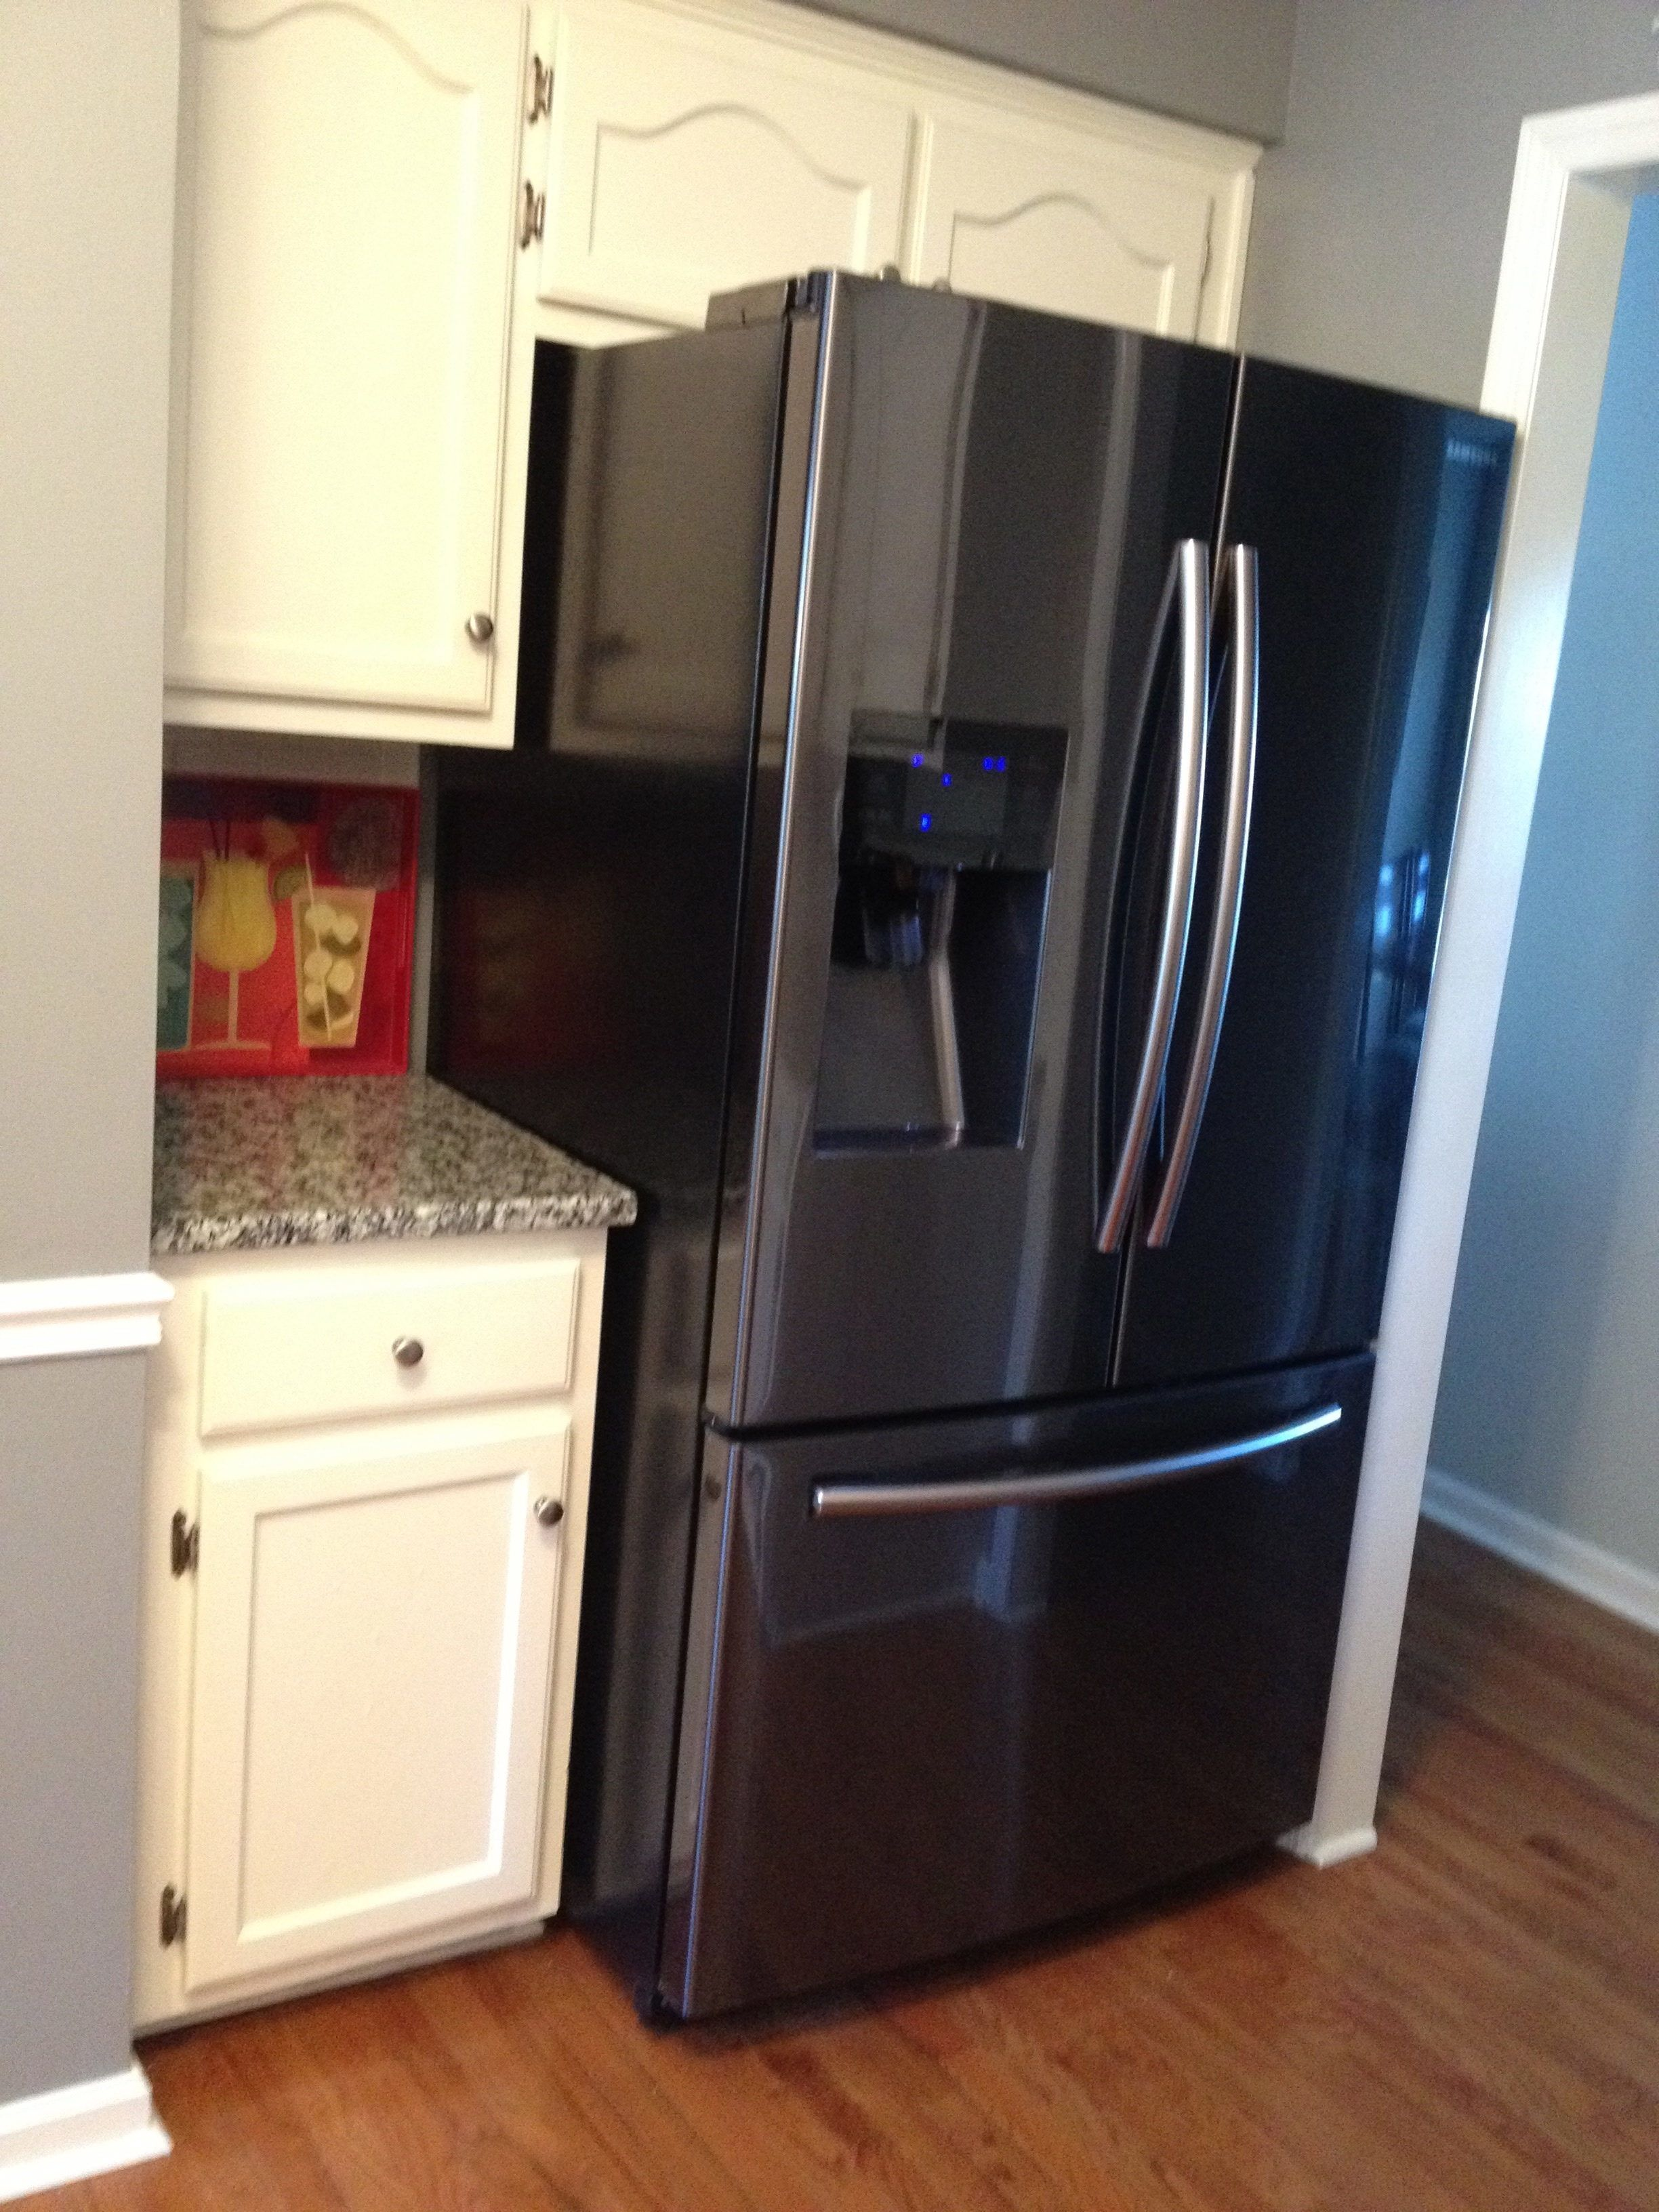 100 french door refrigerators reviews counter depth french french door refrigerators fandeluxe Gallery